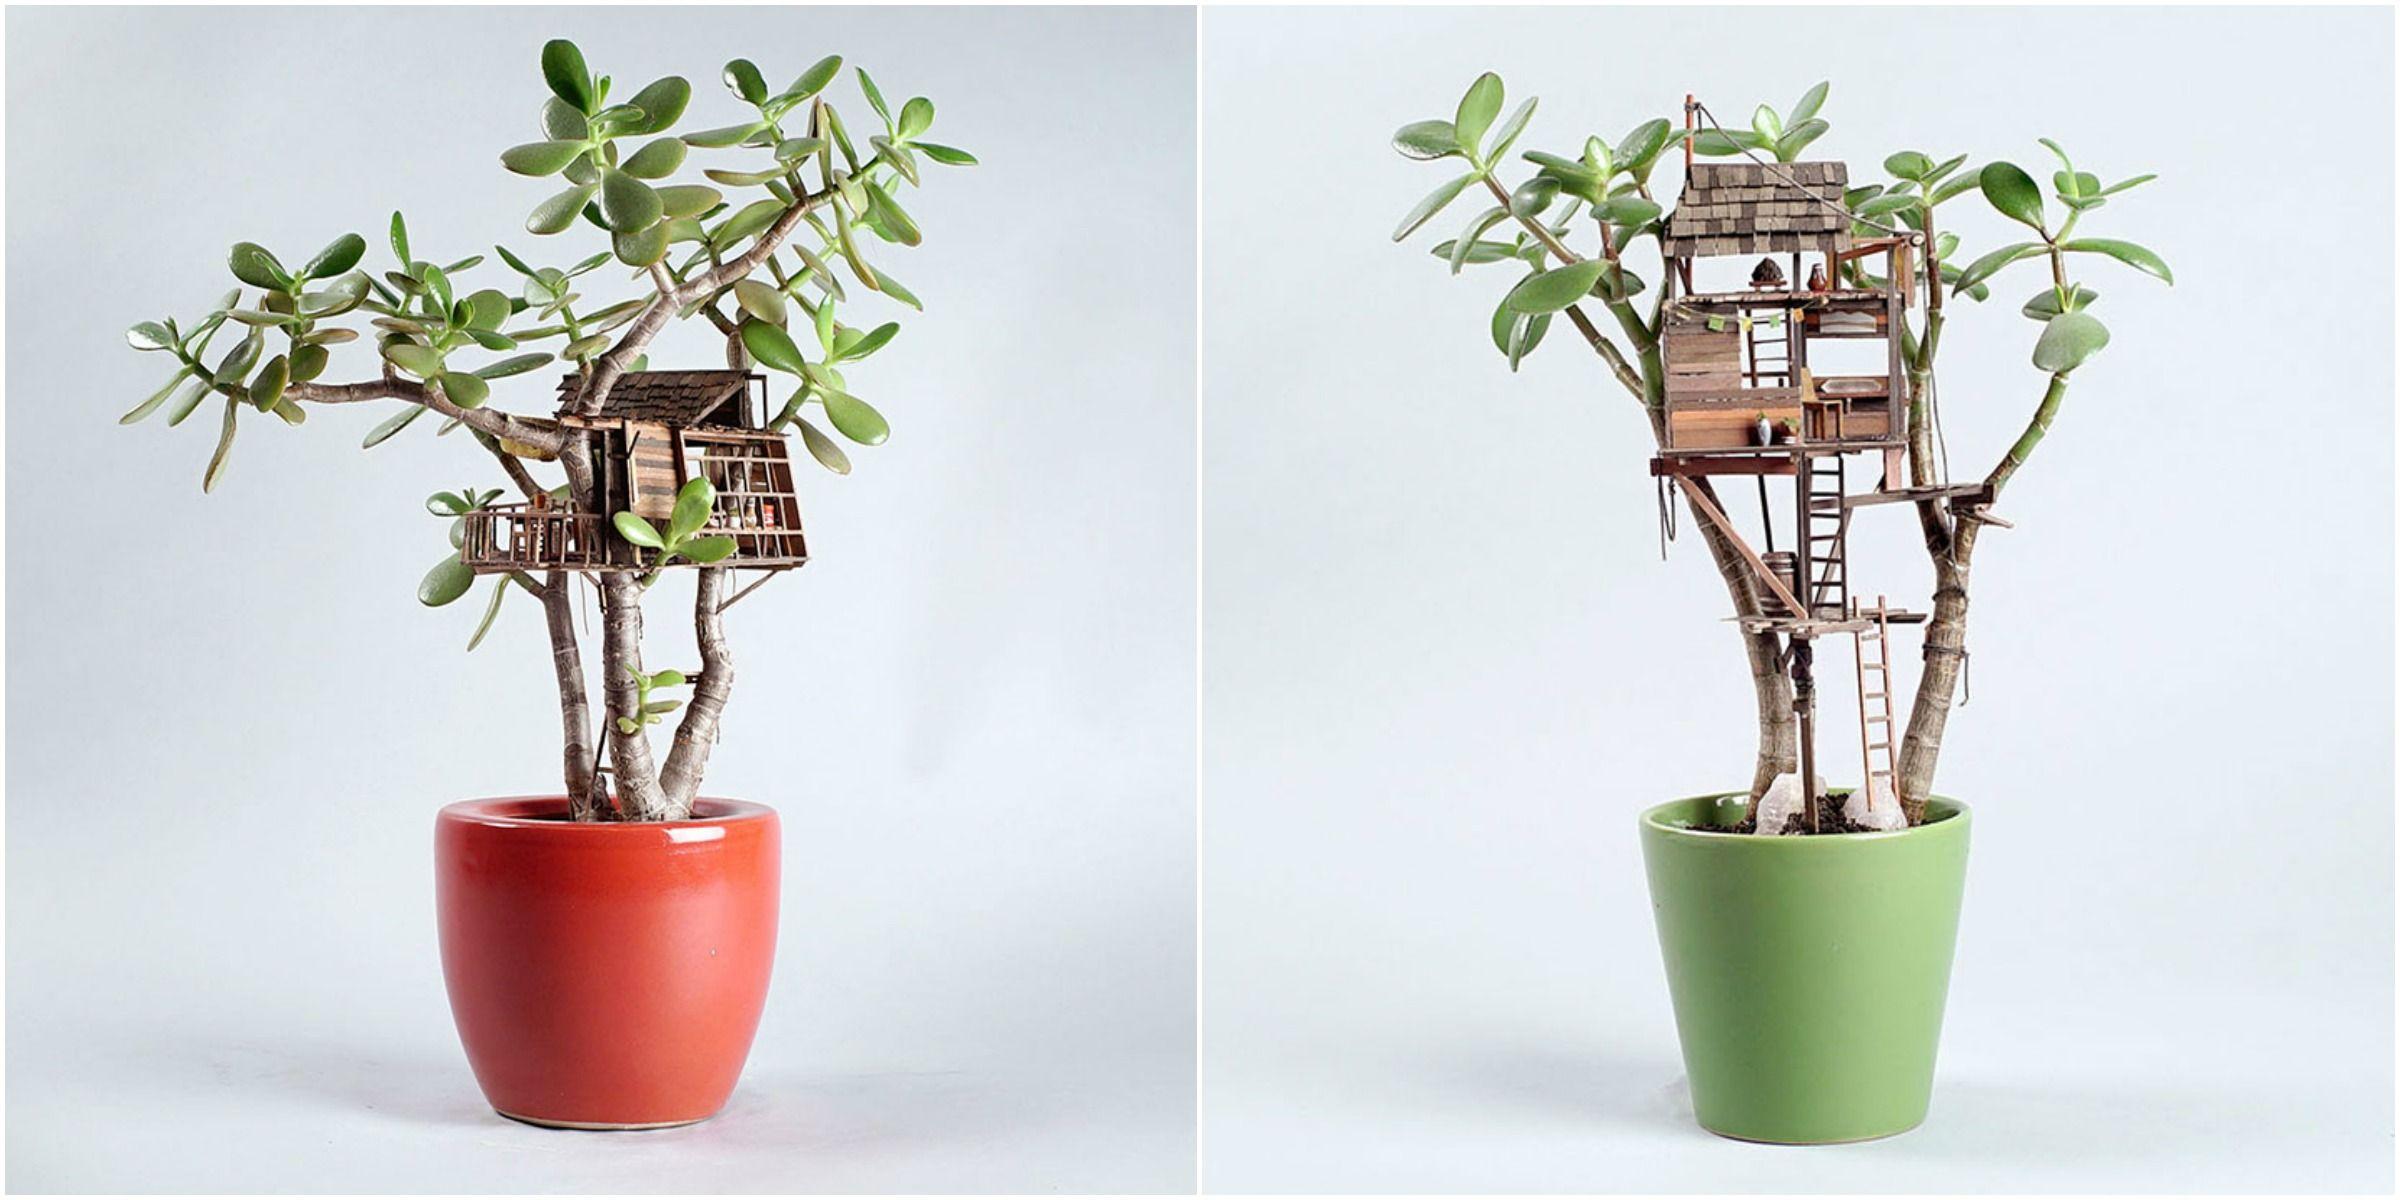 How to Grow Miniature Houseplants